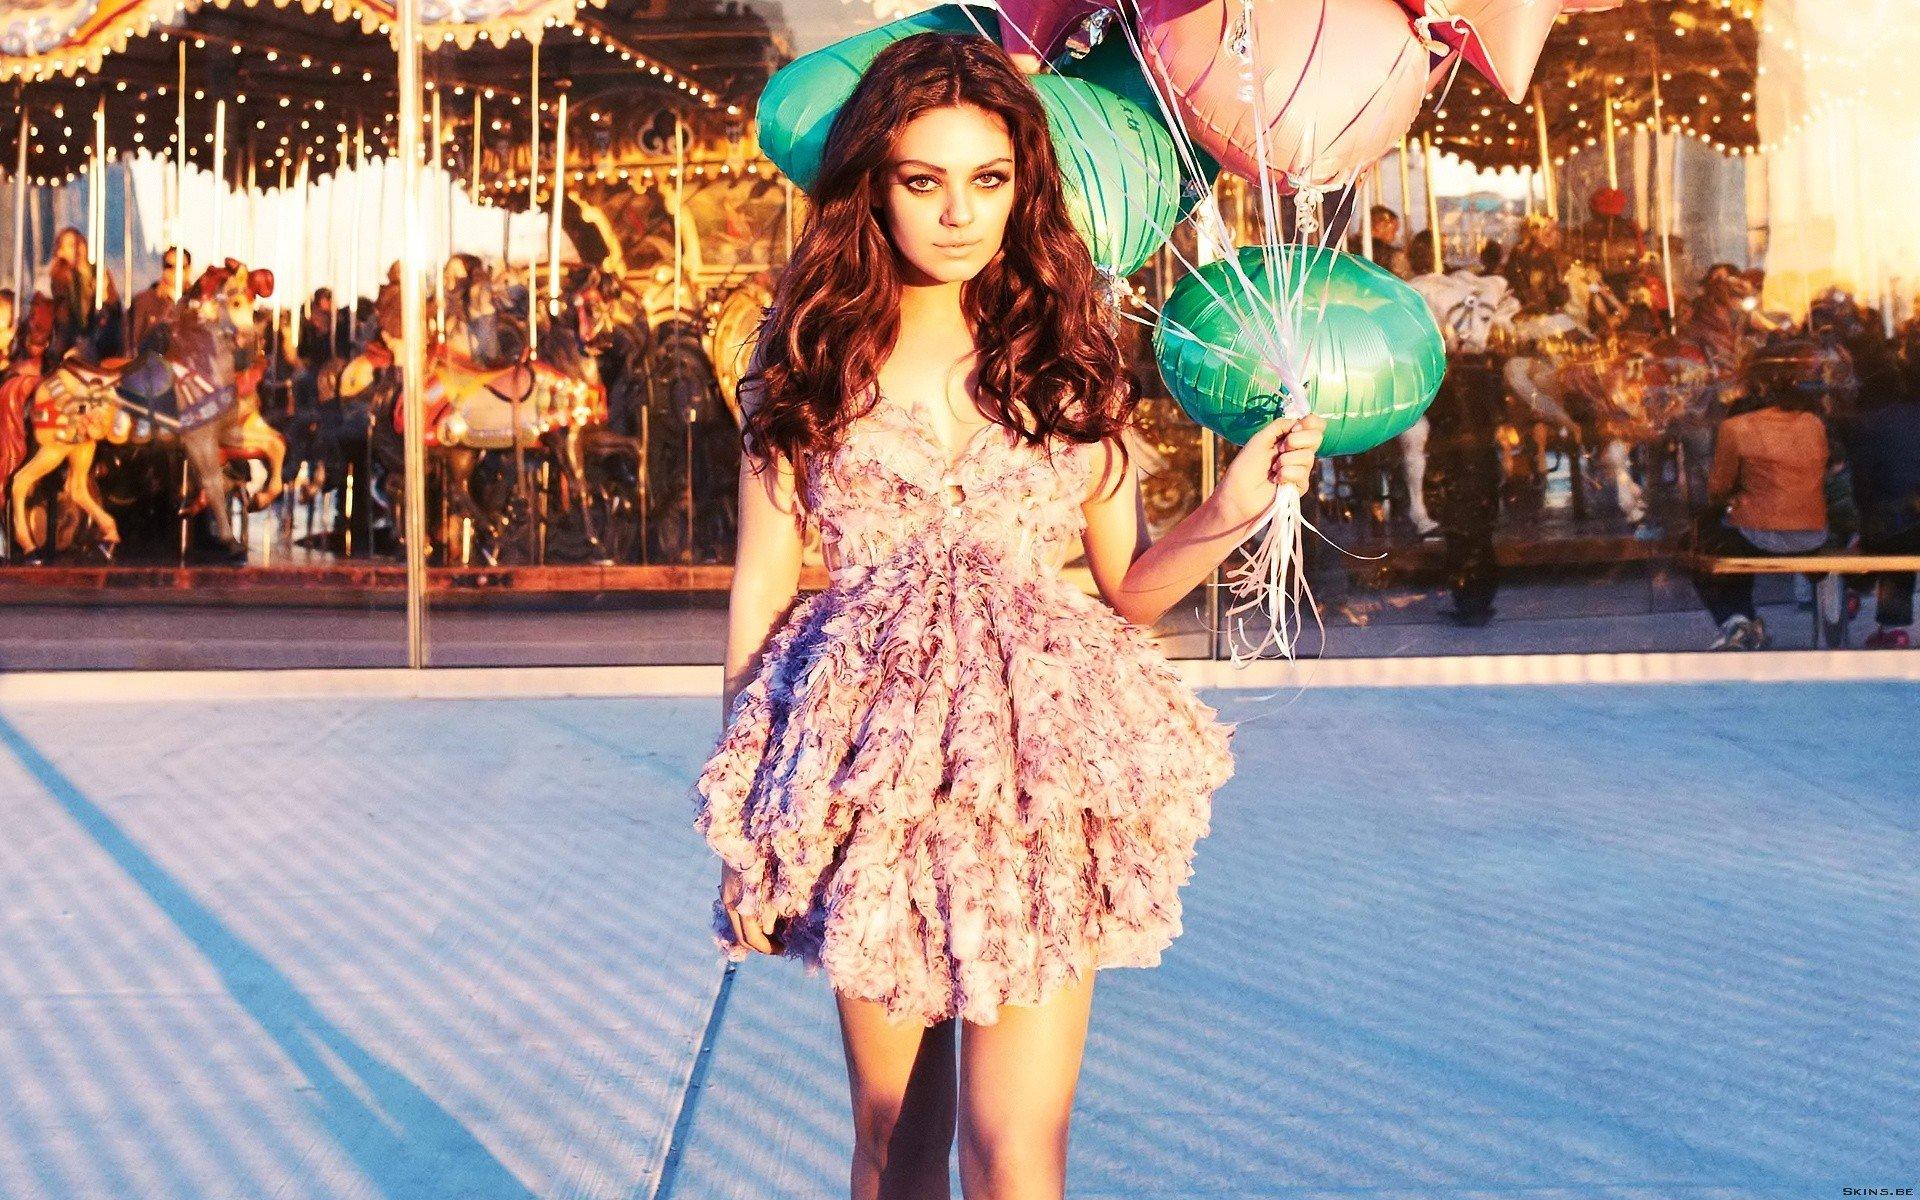 women, Mila Kunis, Actress Wallpaper